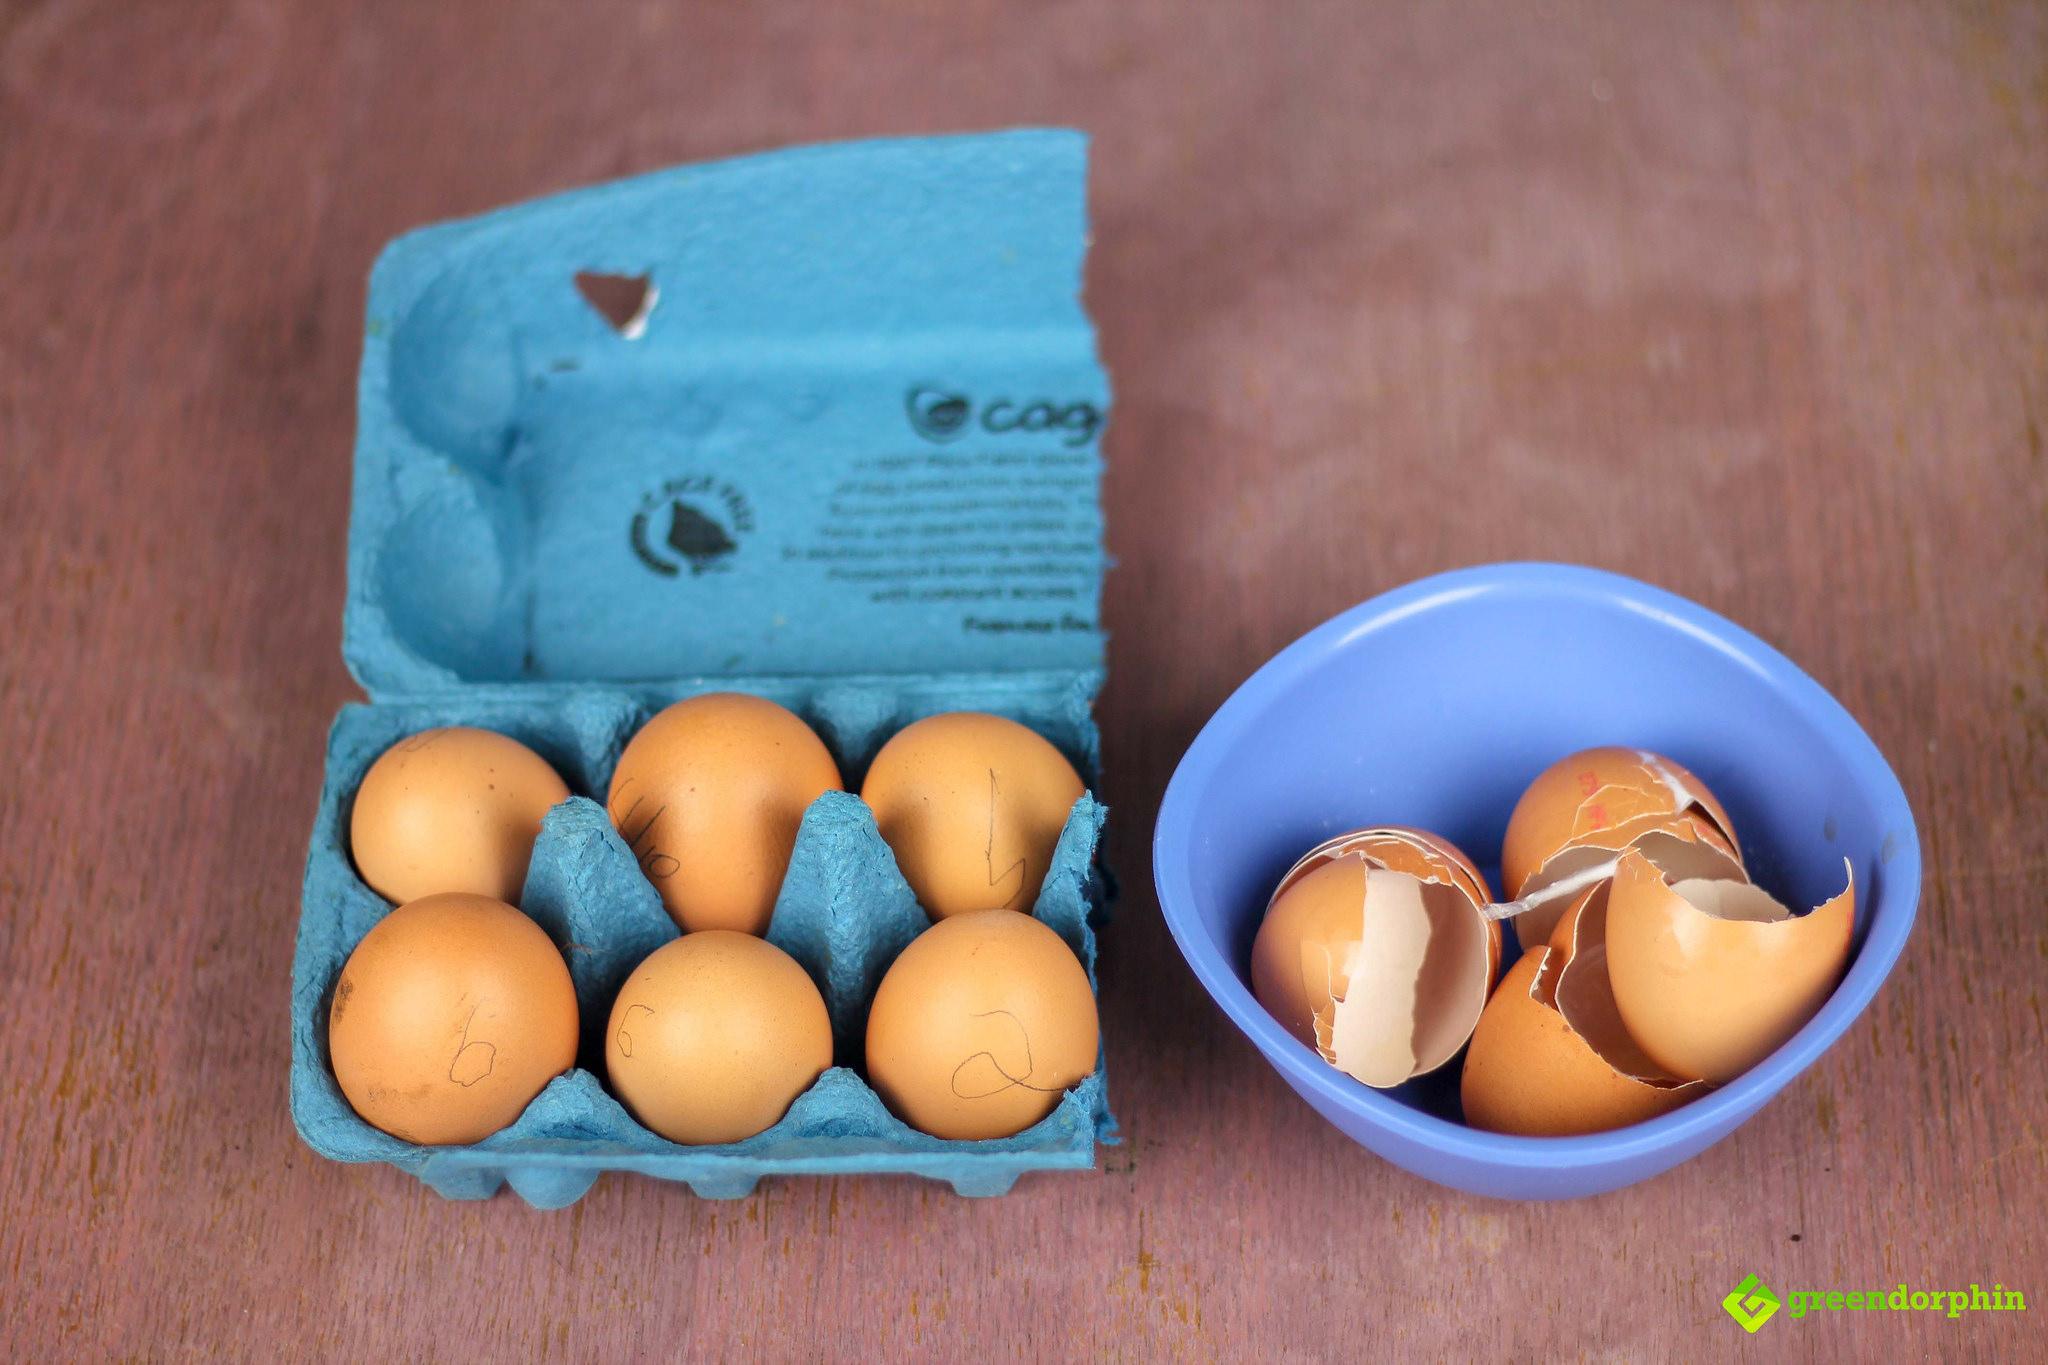 Grow organic weed egg shells